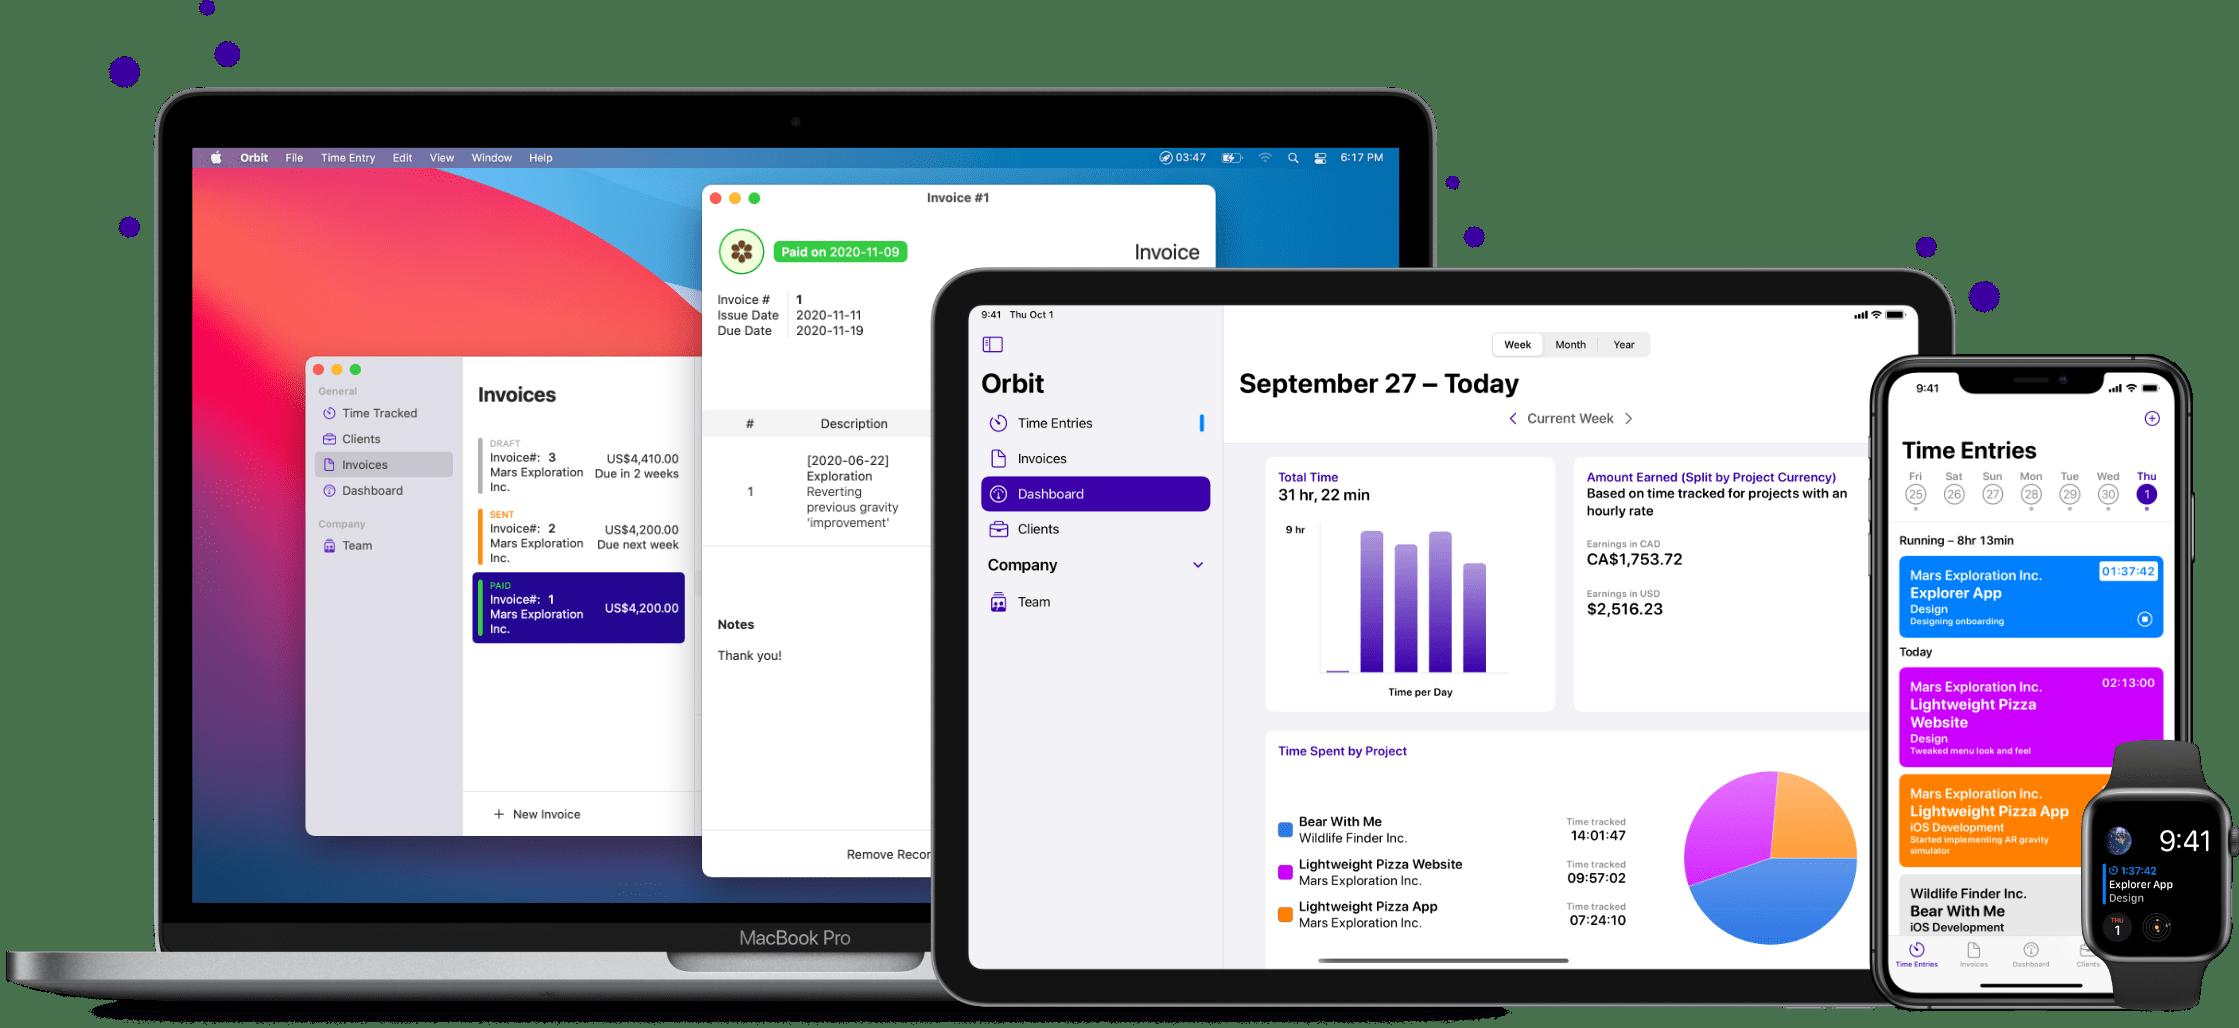 Orbit on macOS, iPadOS, iOS, and watchOS